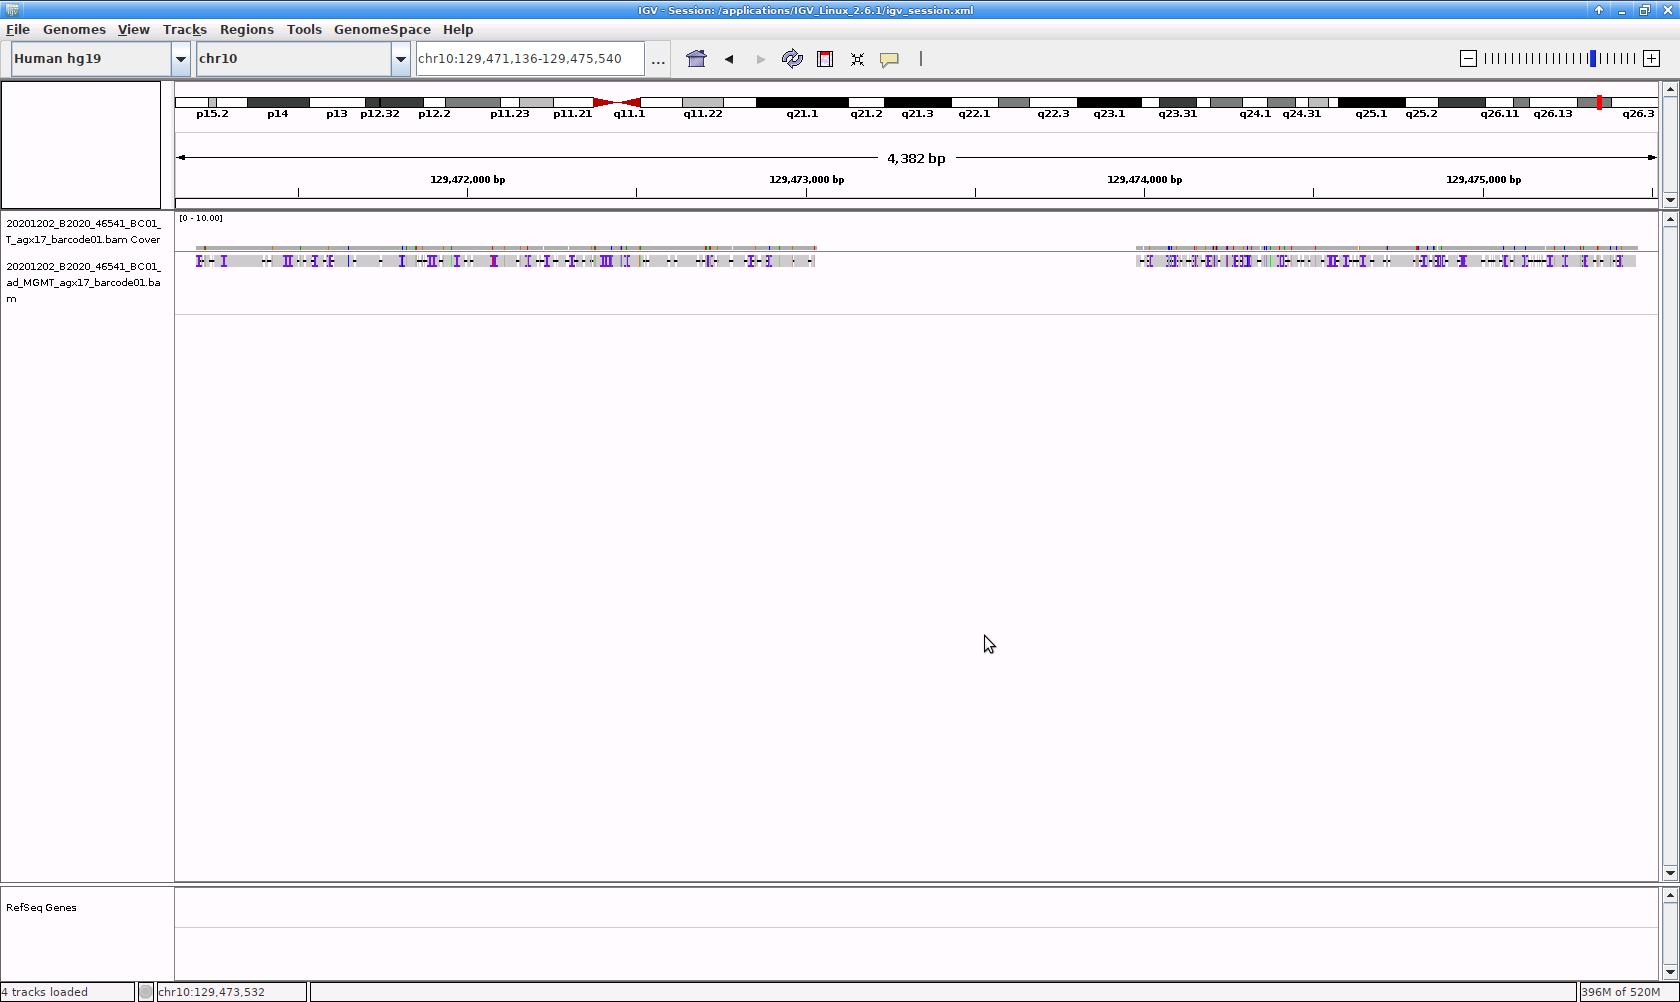 Screenshot_2020-12-02_22-52-14